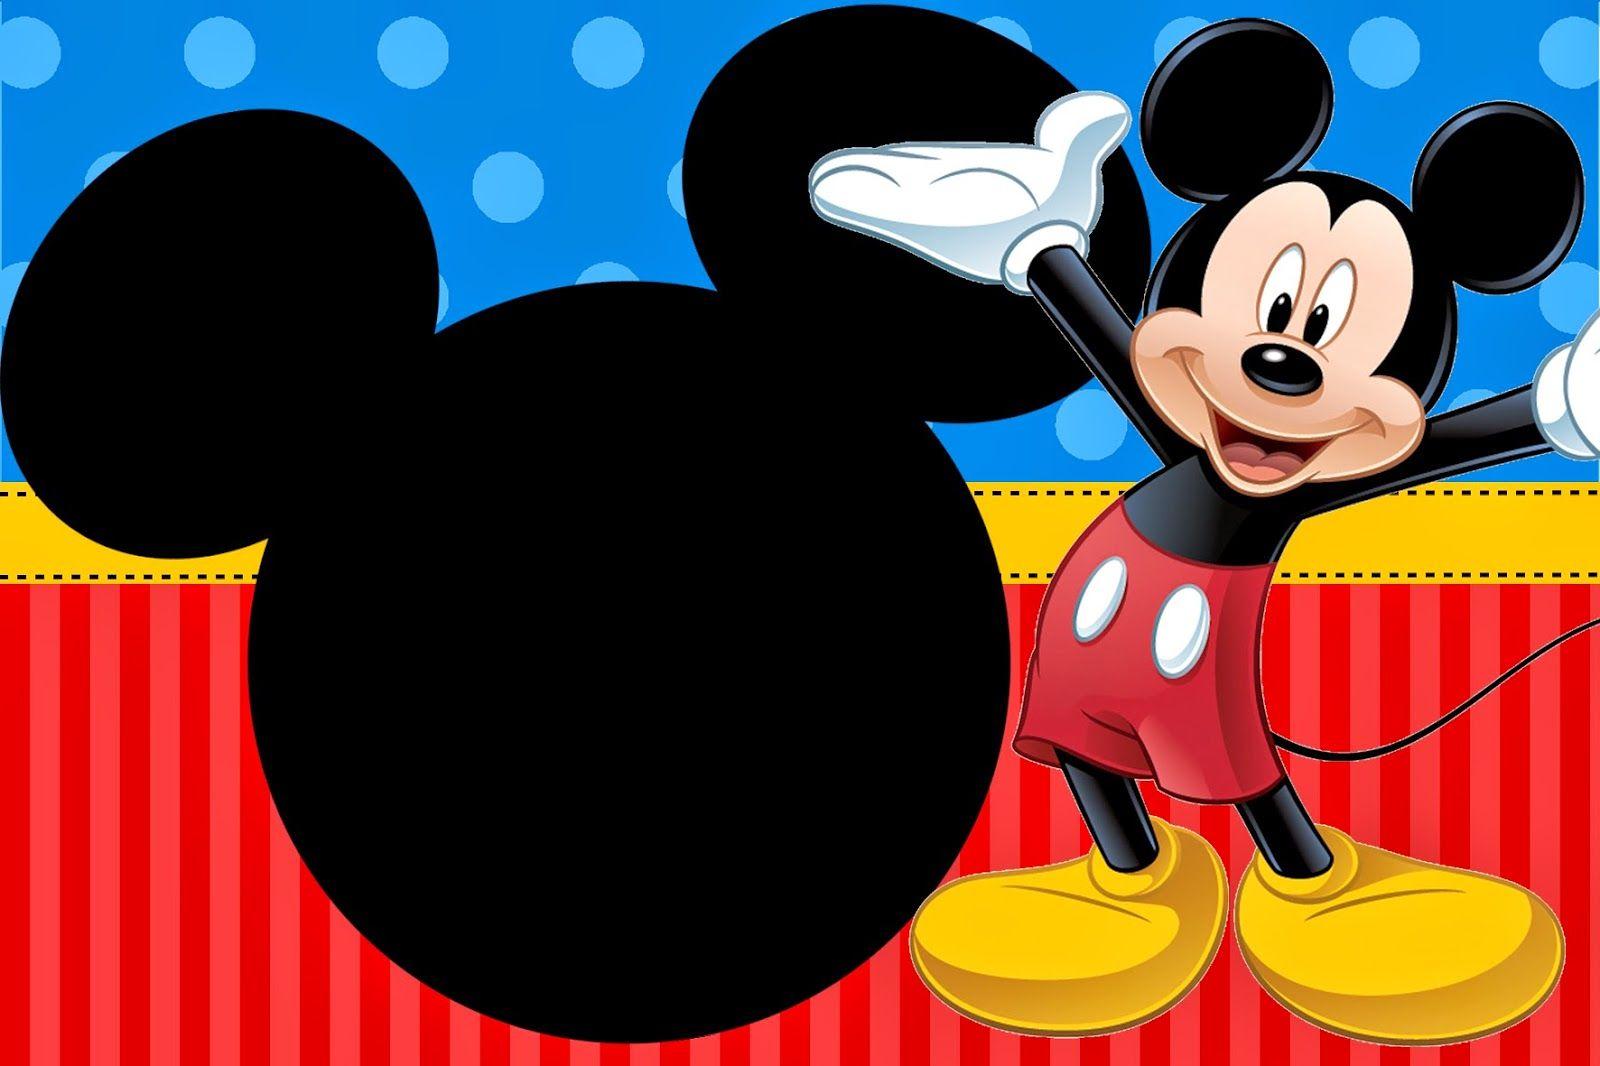 Mickey Invitations was beautiful invitations example